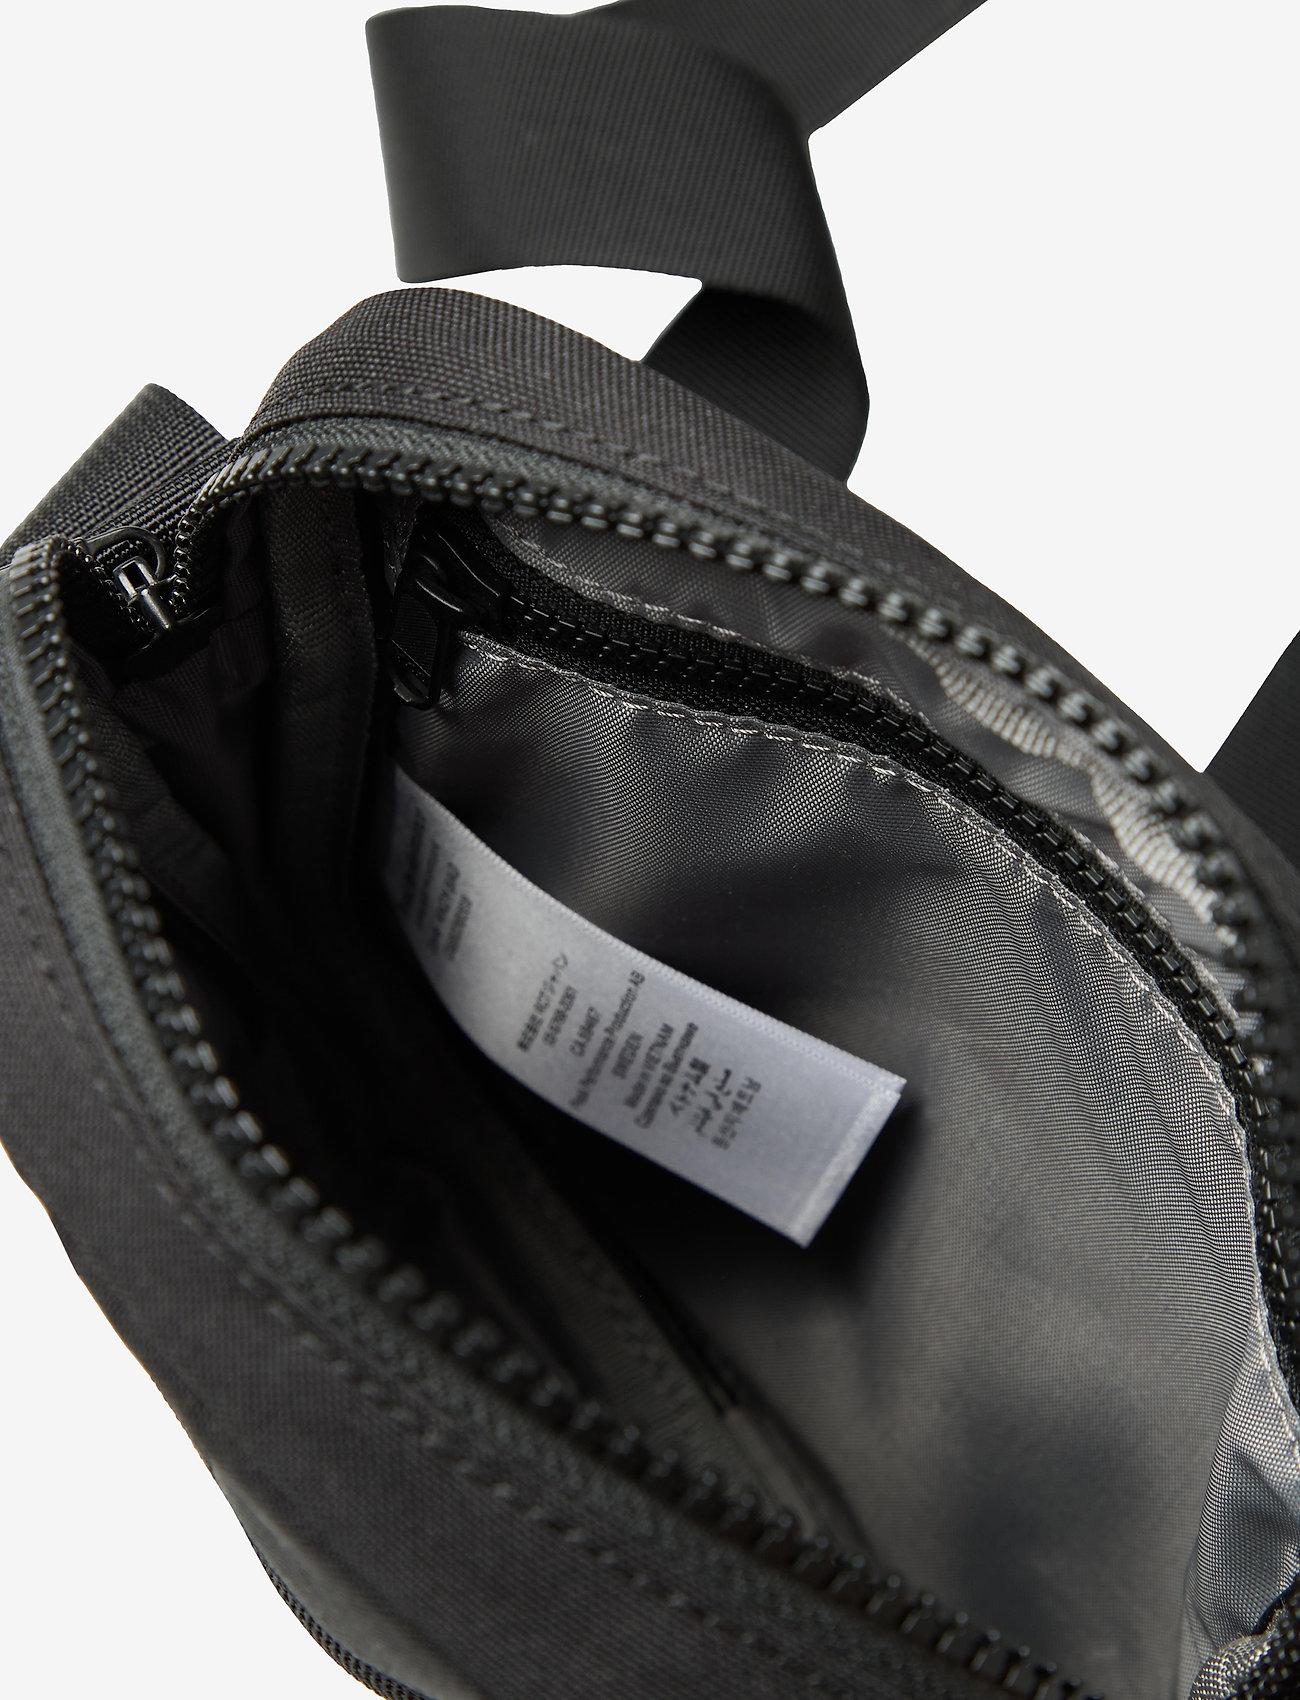 Andy Bag Black (Black) (40 €) - Peak Performance Qa1Z0